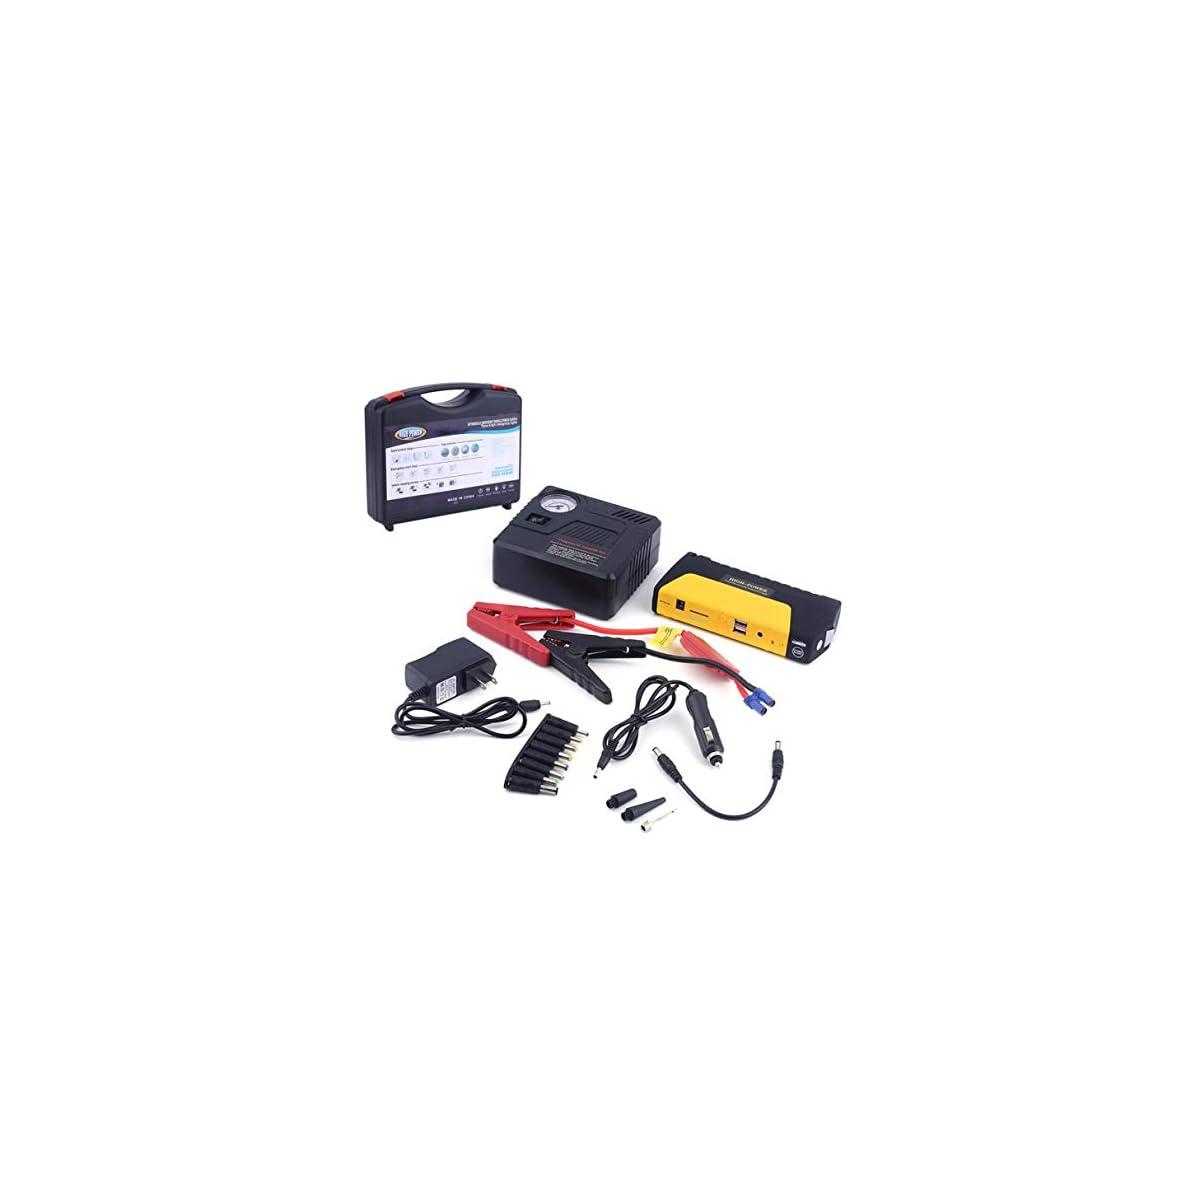 41Q2t9JXNQL. SS1200  - Salte la batería del arrancador, batería del banco de potencia del reforzador del cargador de emergencia del cargador del coche del motor del automóvil del coche del motor del coche de 68800MAHUSB.